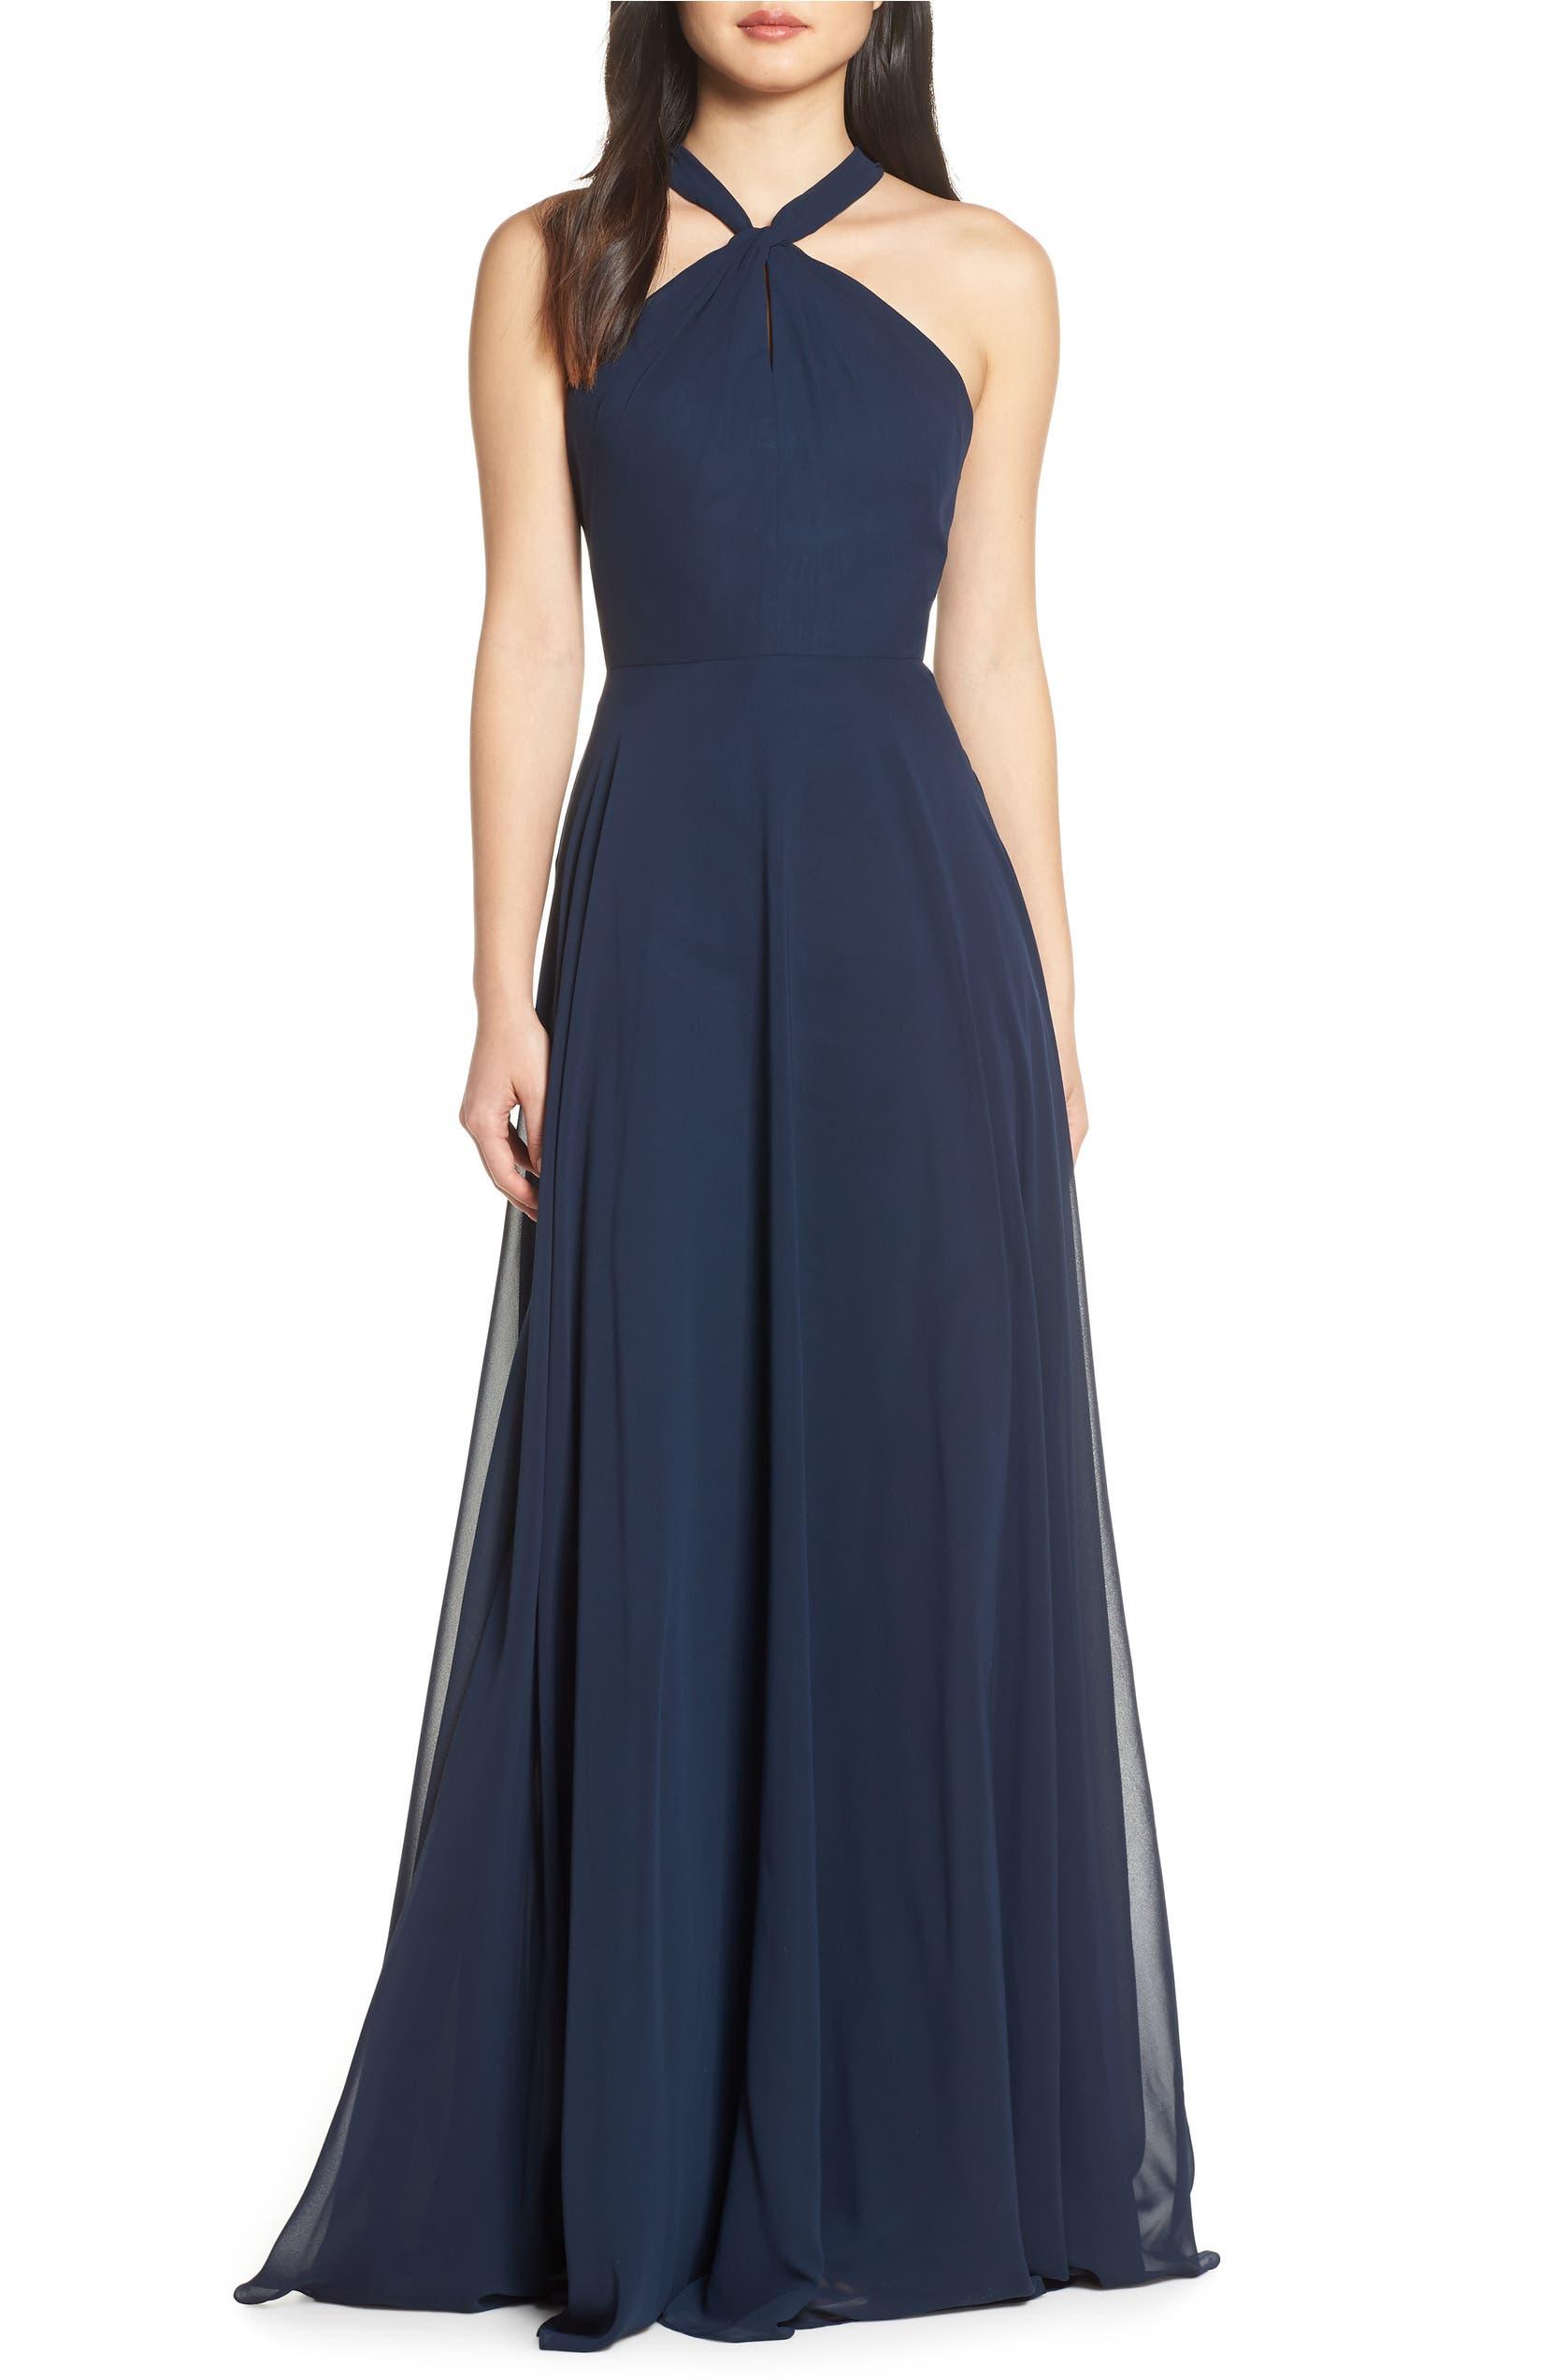 b3a1907cad0ec Jenny Yoo Halle Halter Evening Dress | Nordstrom